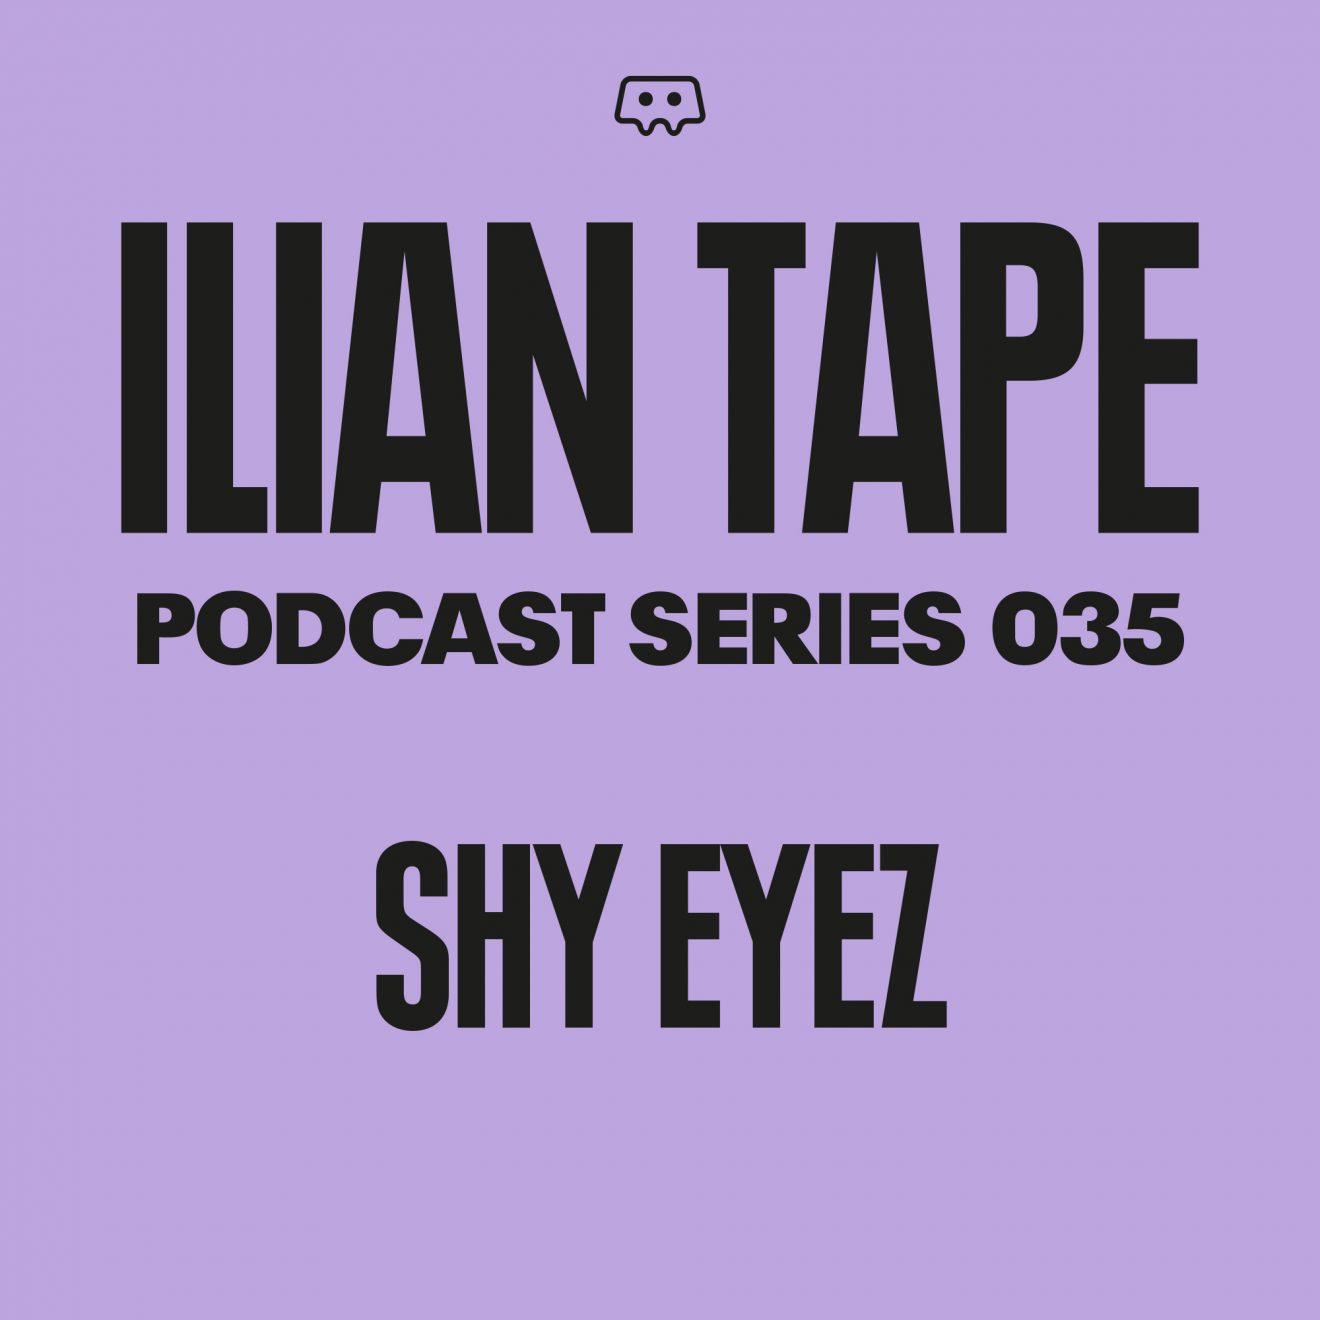 Ilian Tape Podcast Series 035